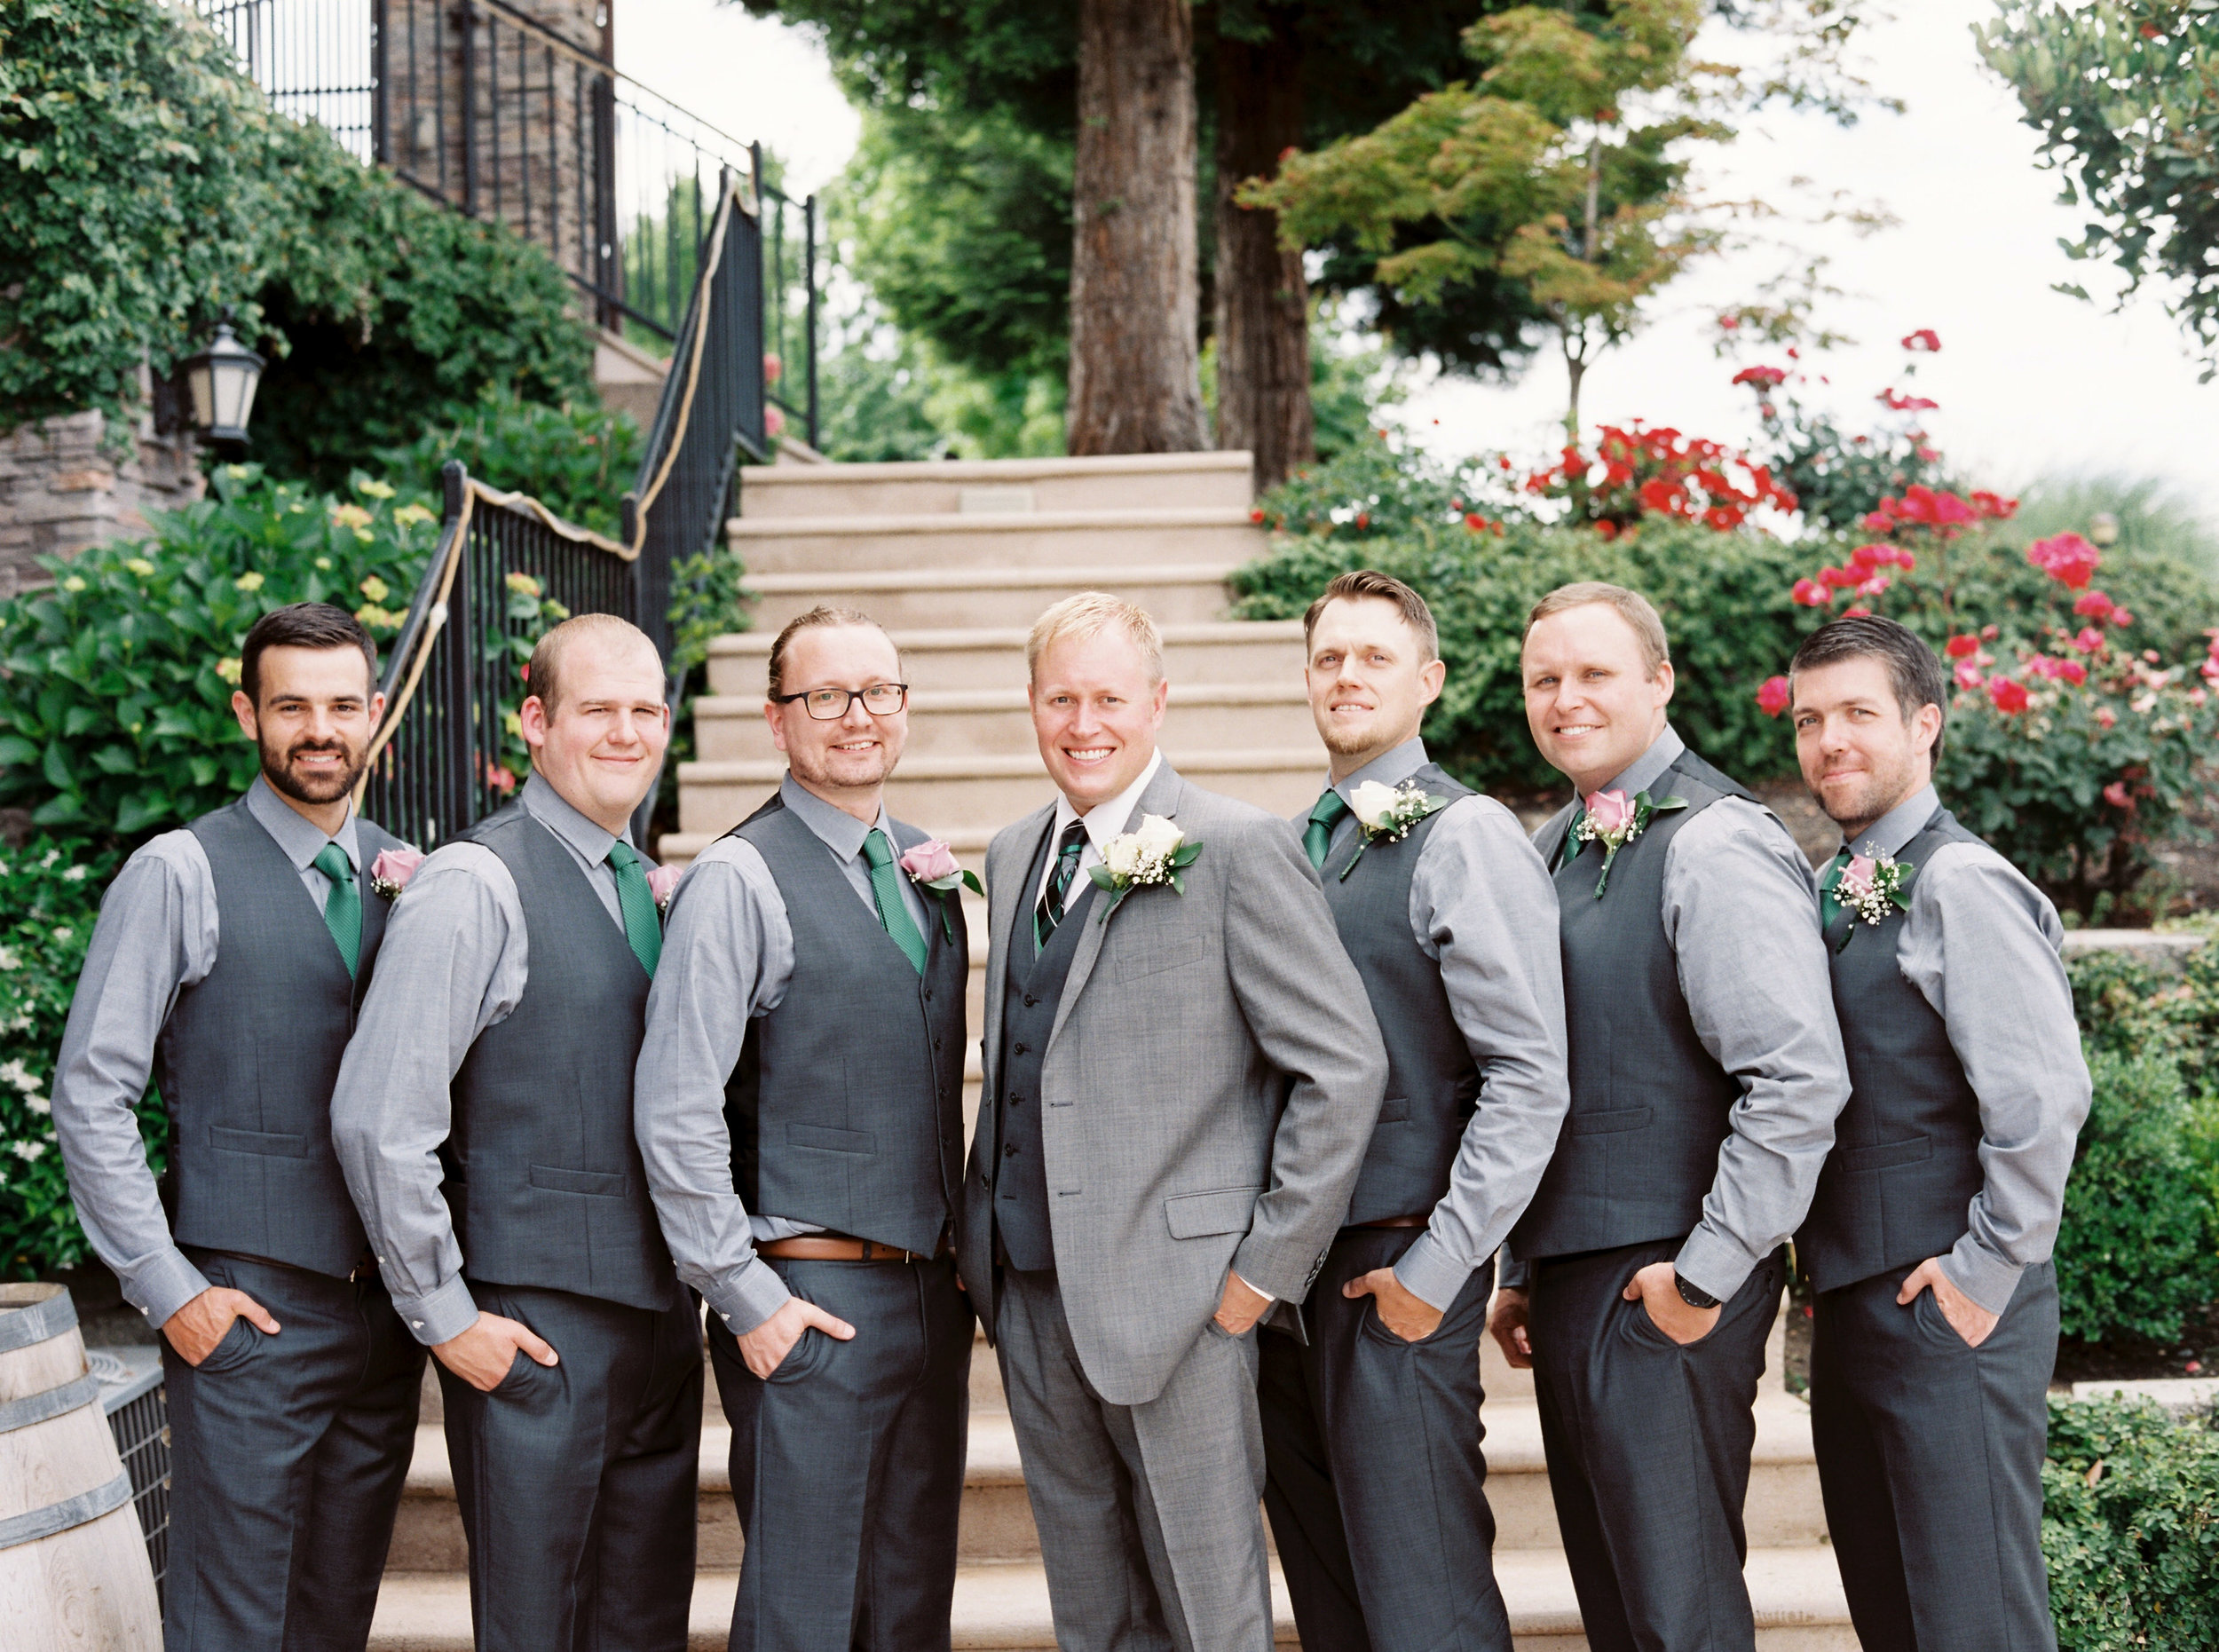 wolfe-heights-event-center-wedding-sacramento-california-wedding-49.jpg